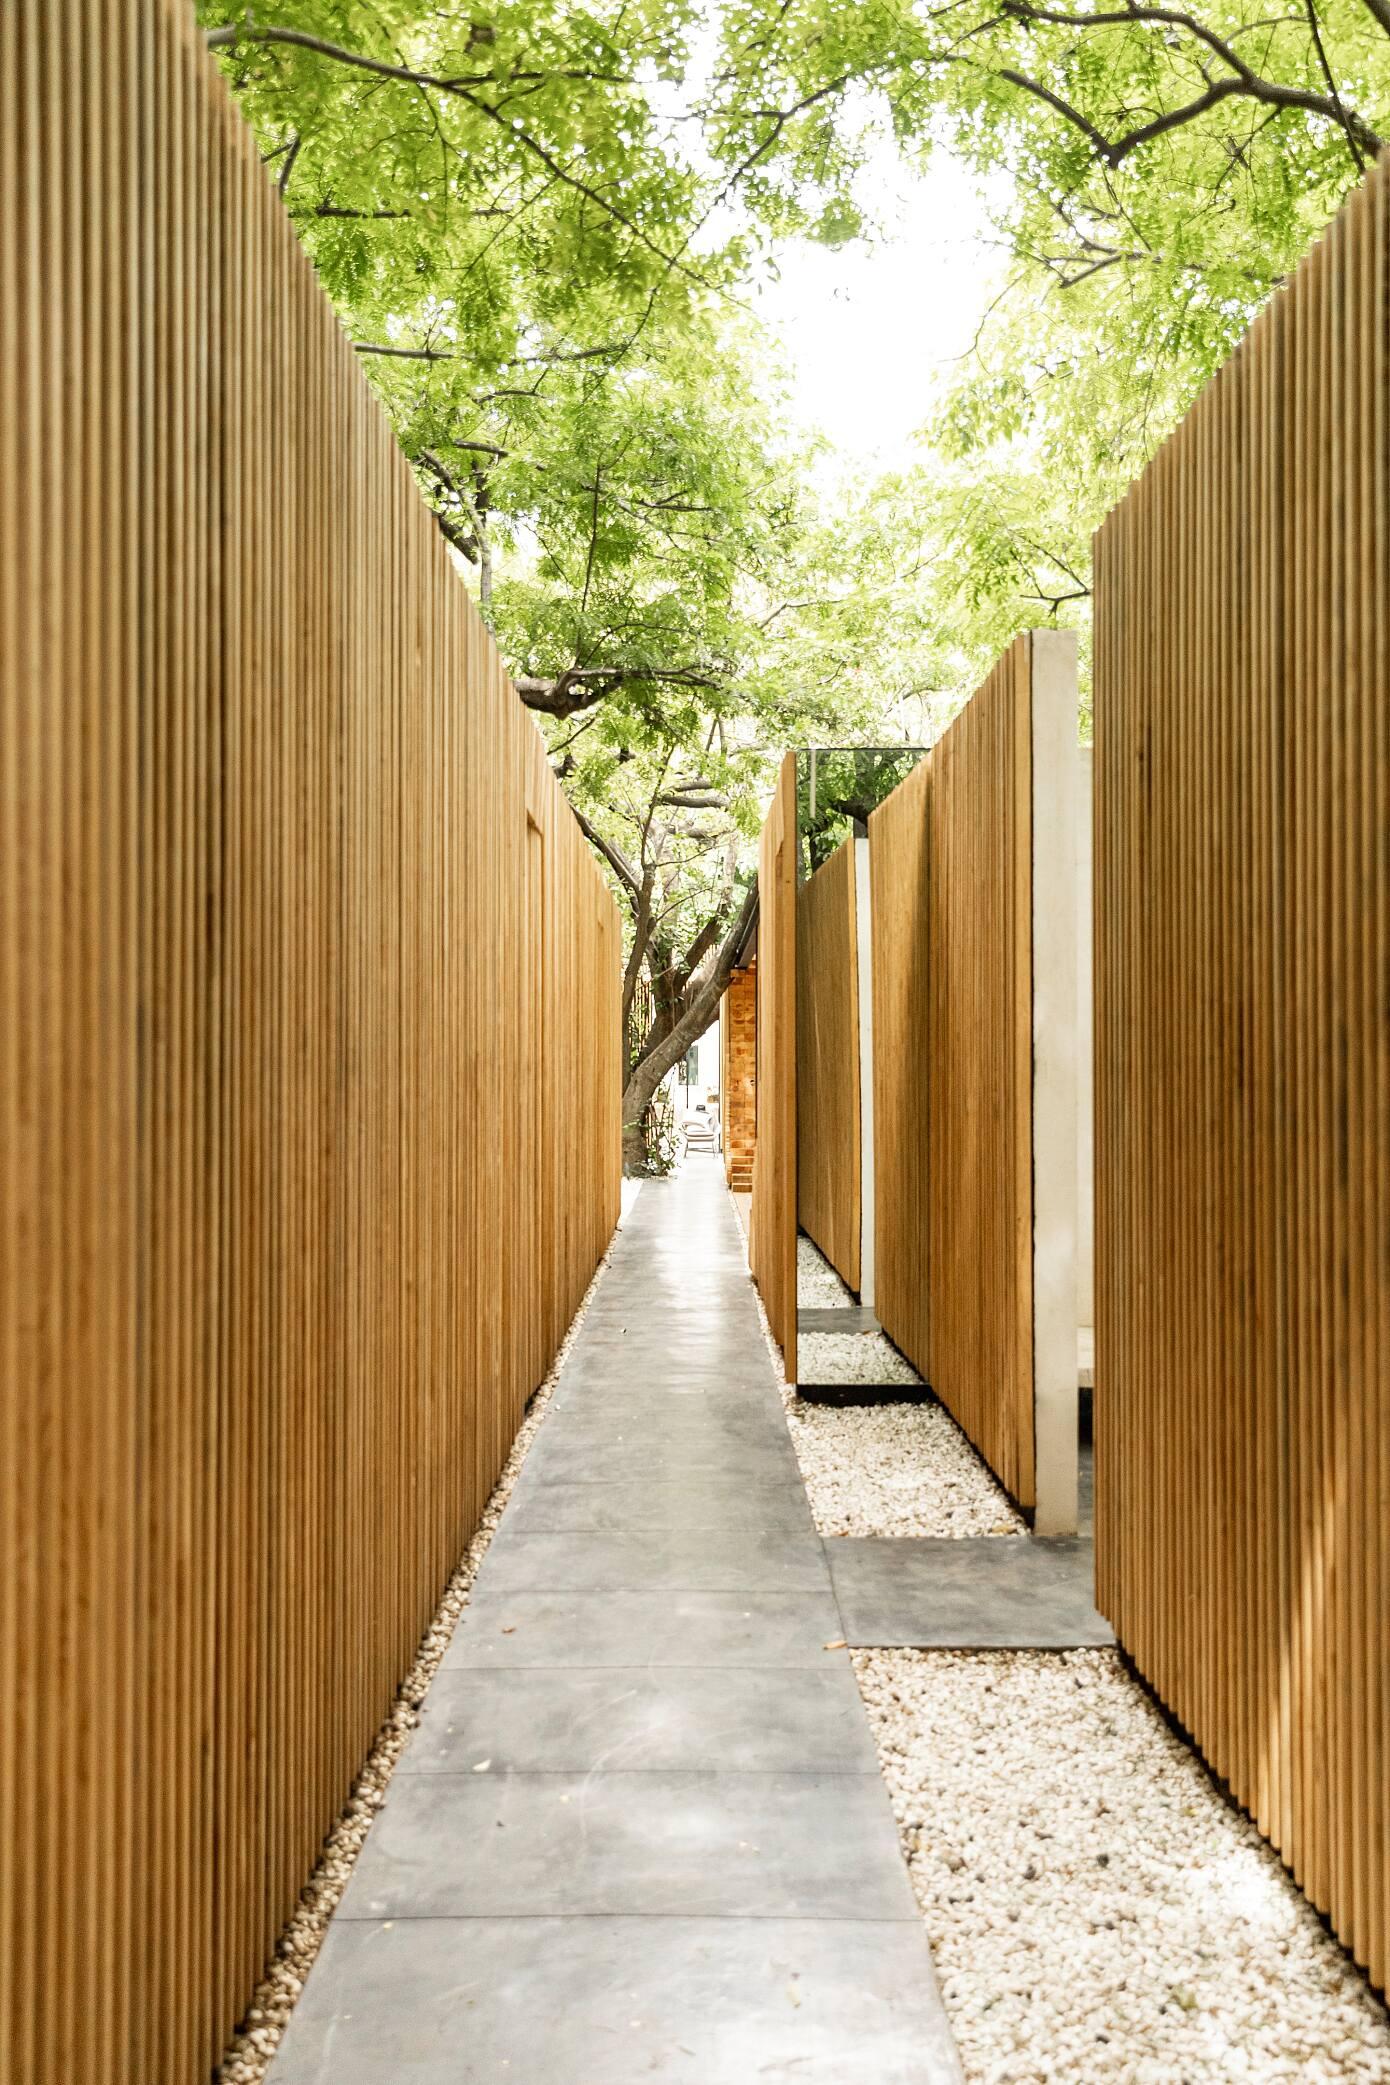 Casa Mague by Mauricio Ceballos X Architects